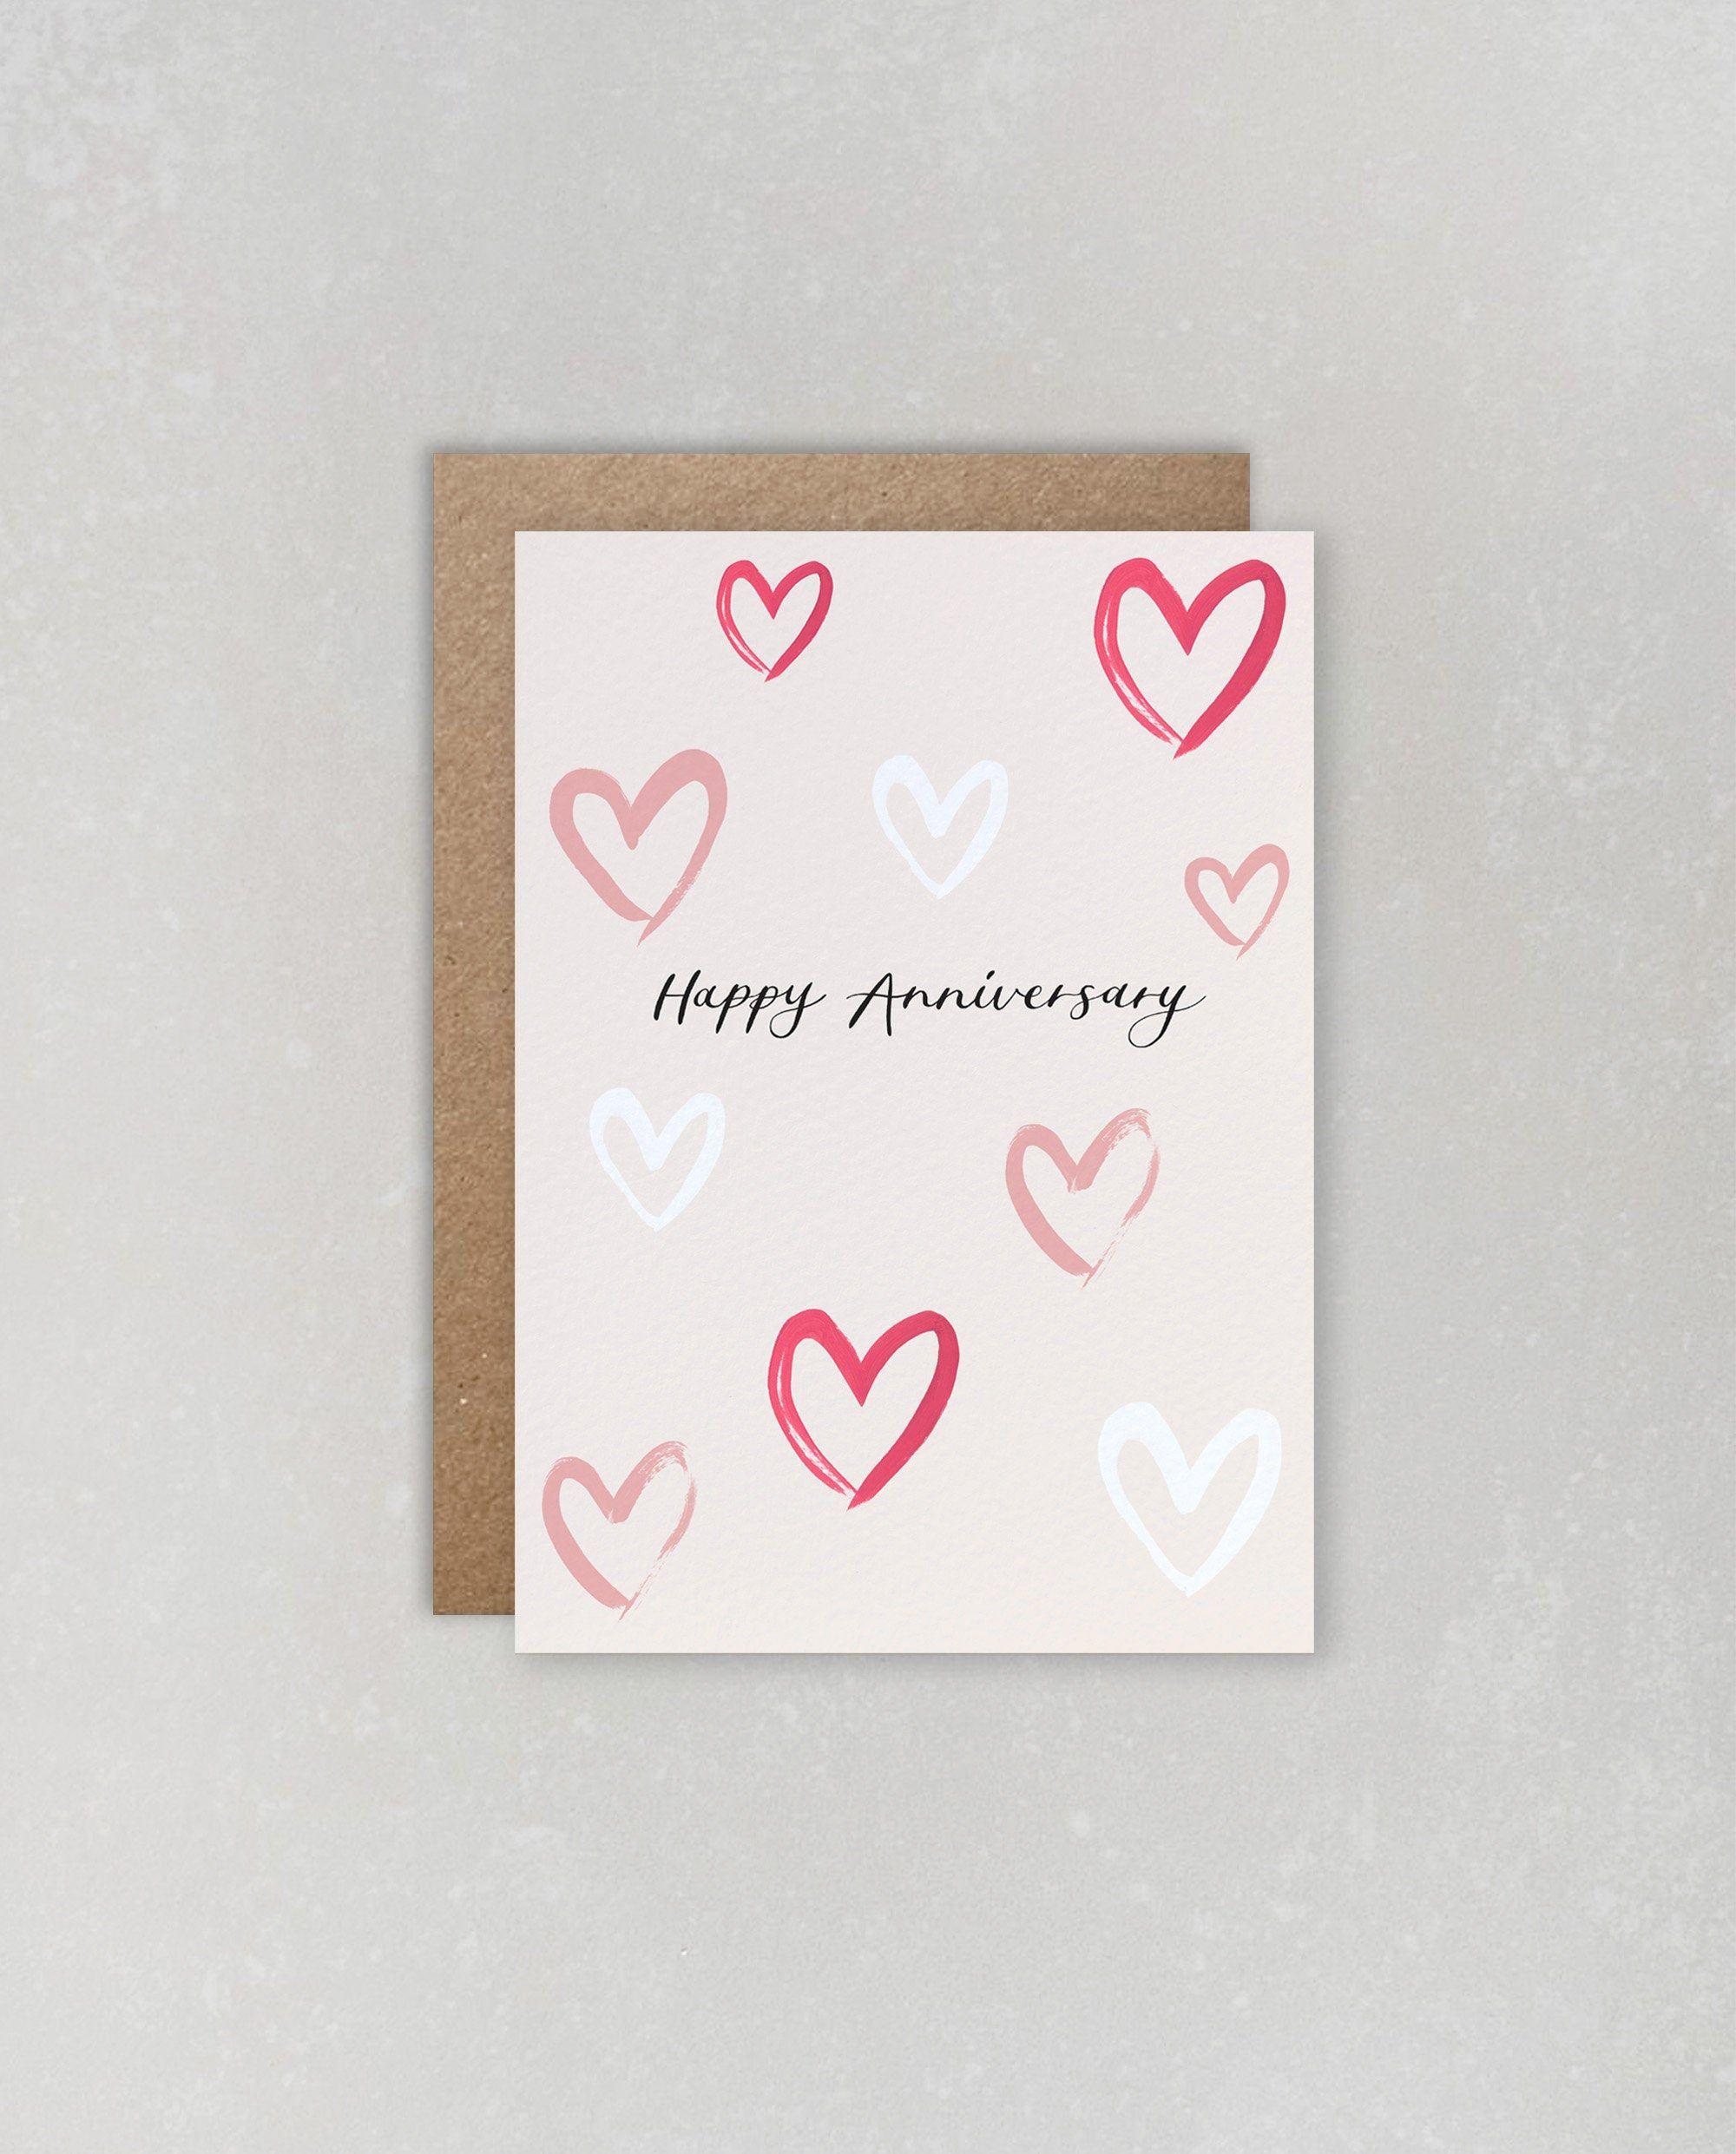 Happy Anniversary Card Heart Card Wedding Anniversary Etsy Happy Anniversary Cards Wedding Anniversary Cards Anniversary Cards